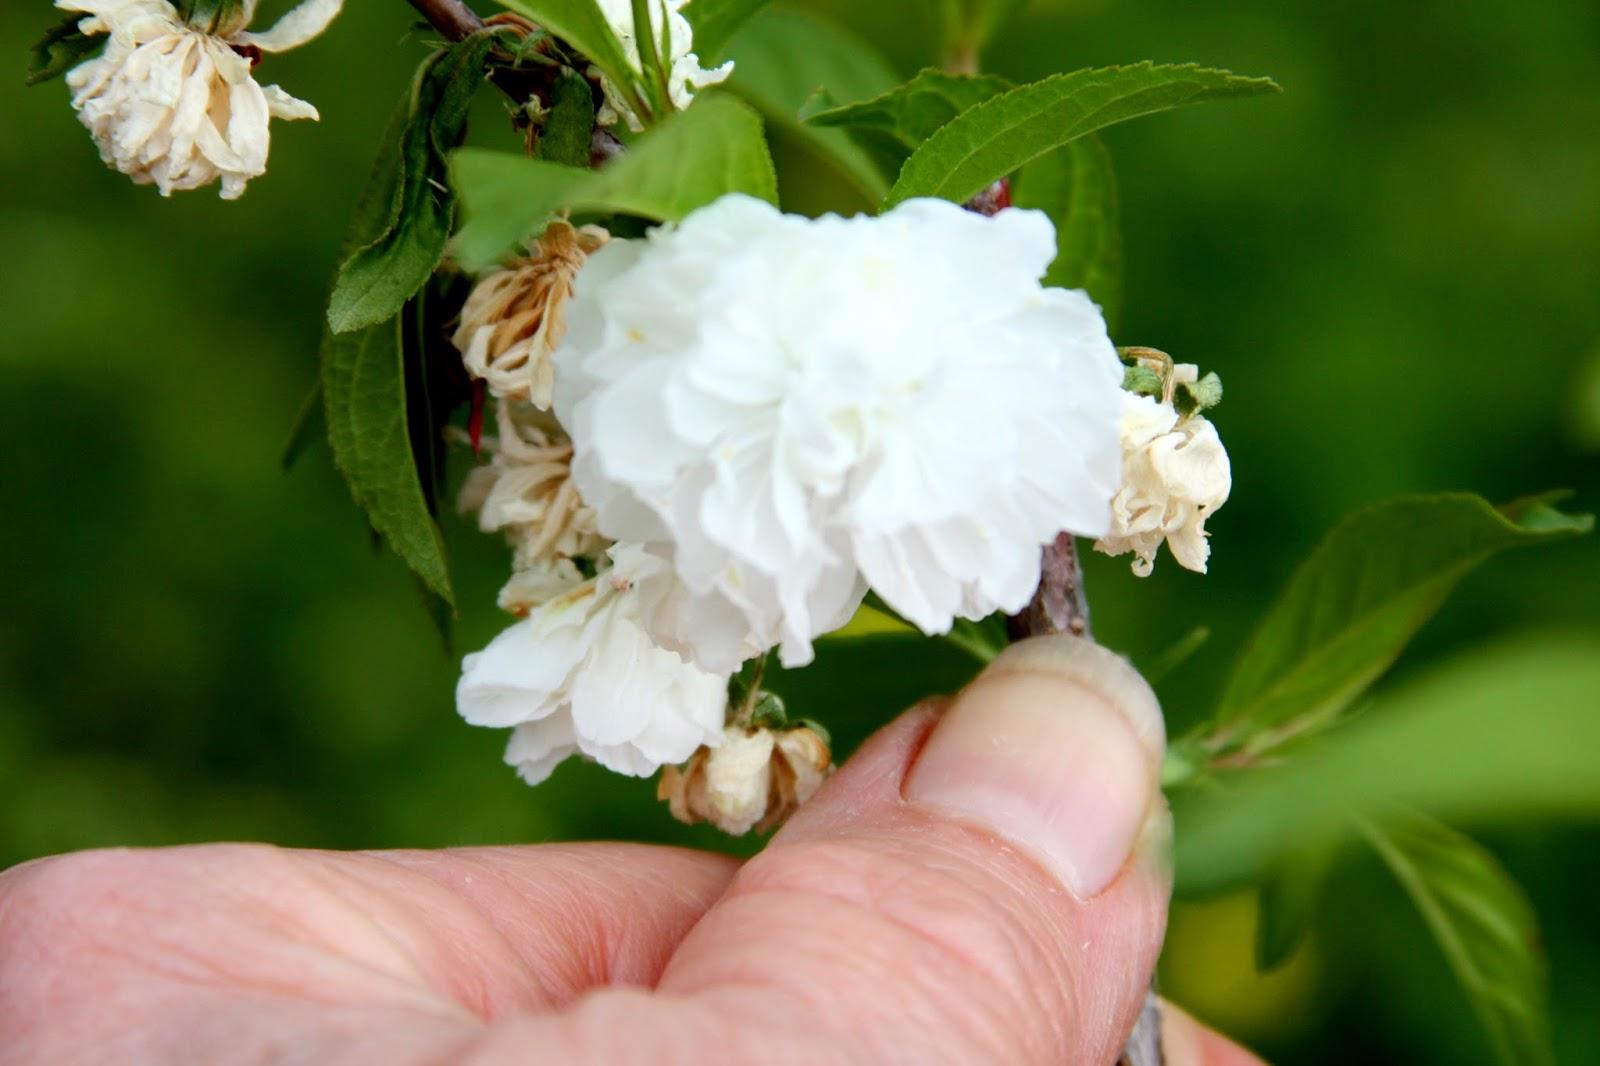 Flowering Almond Shrubs Are Prunus Triloba And Prunus Glandulosa